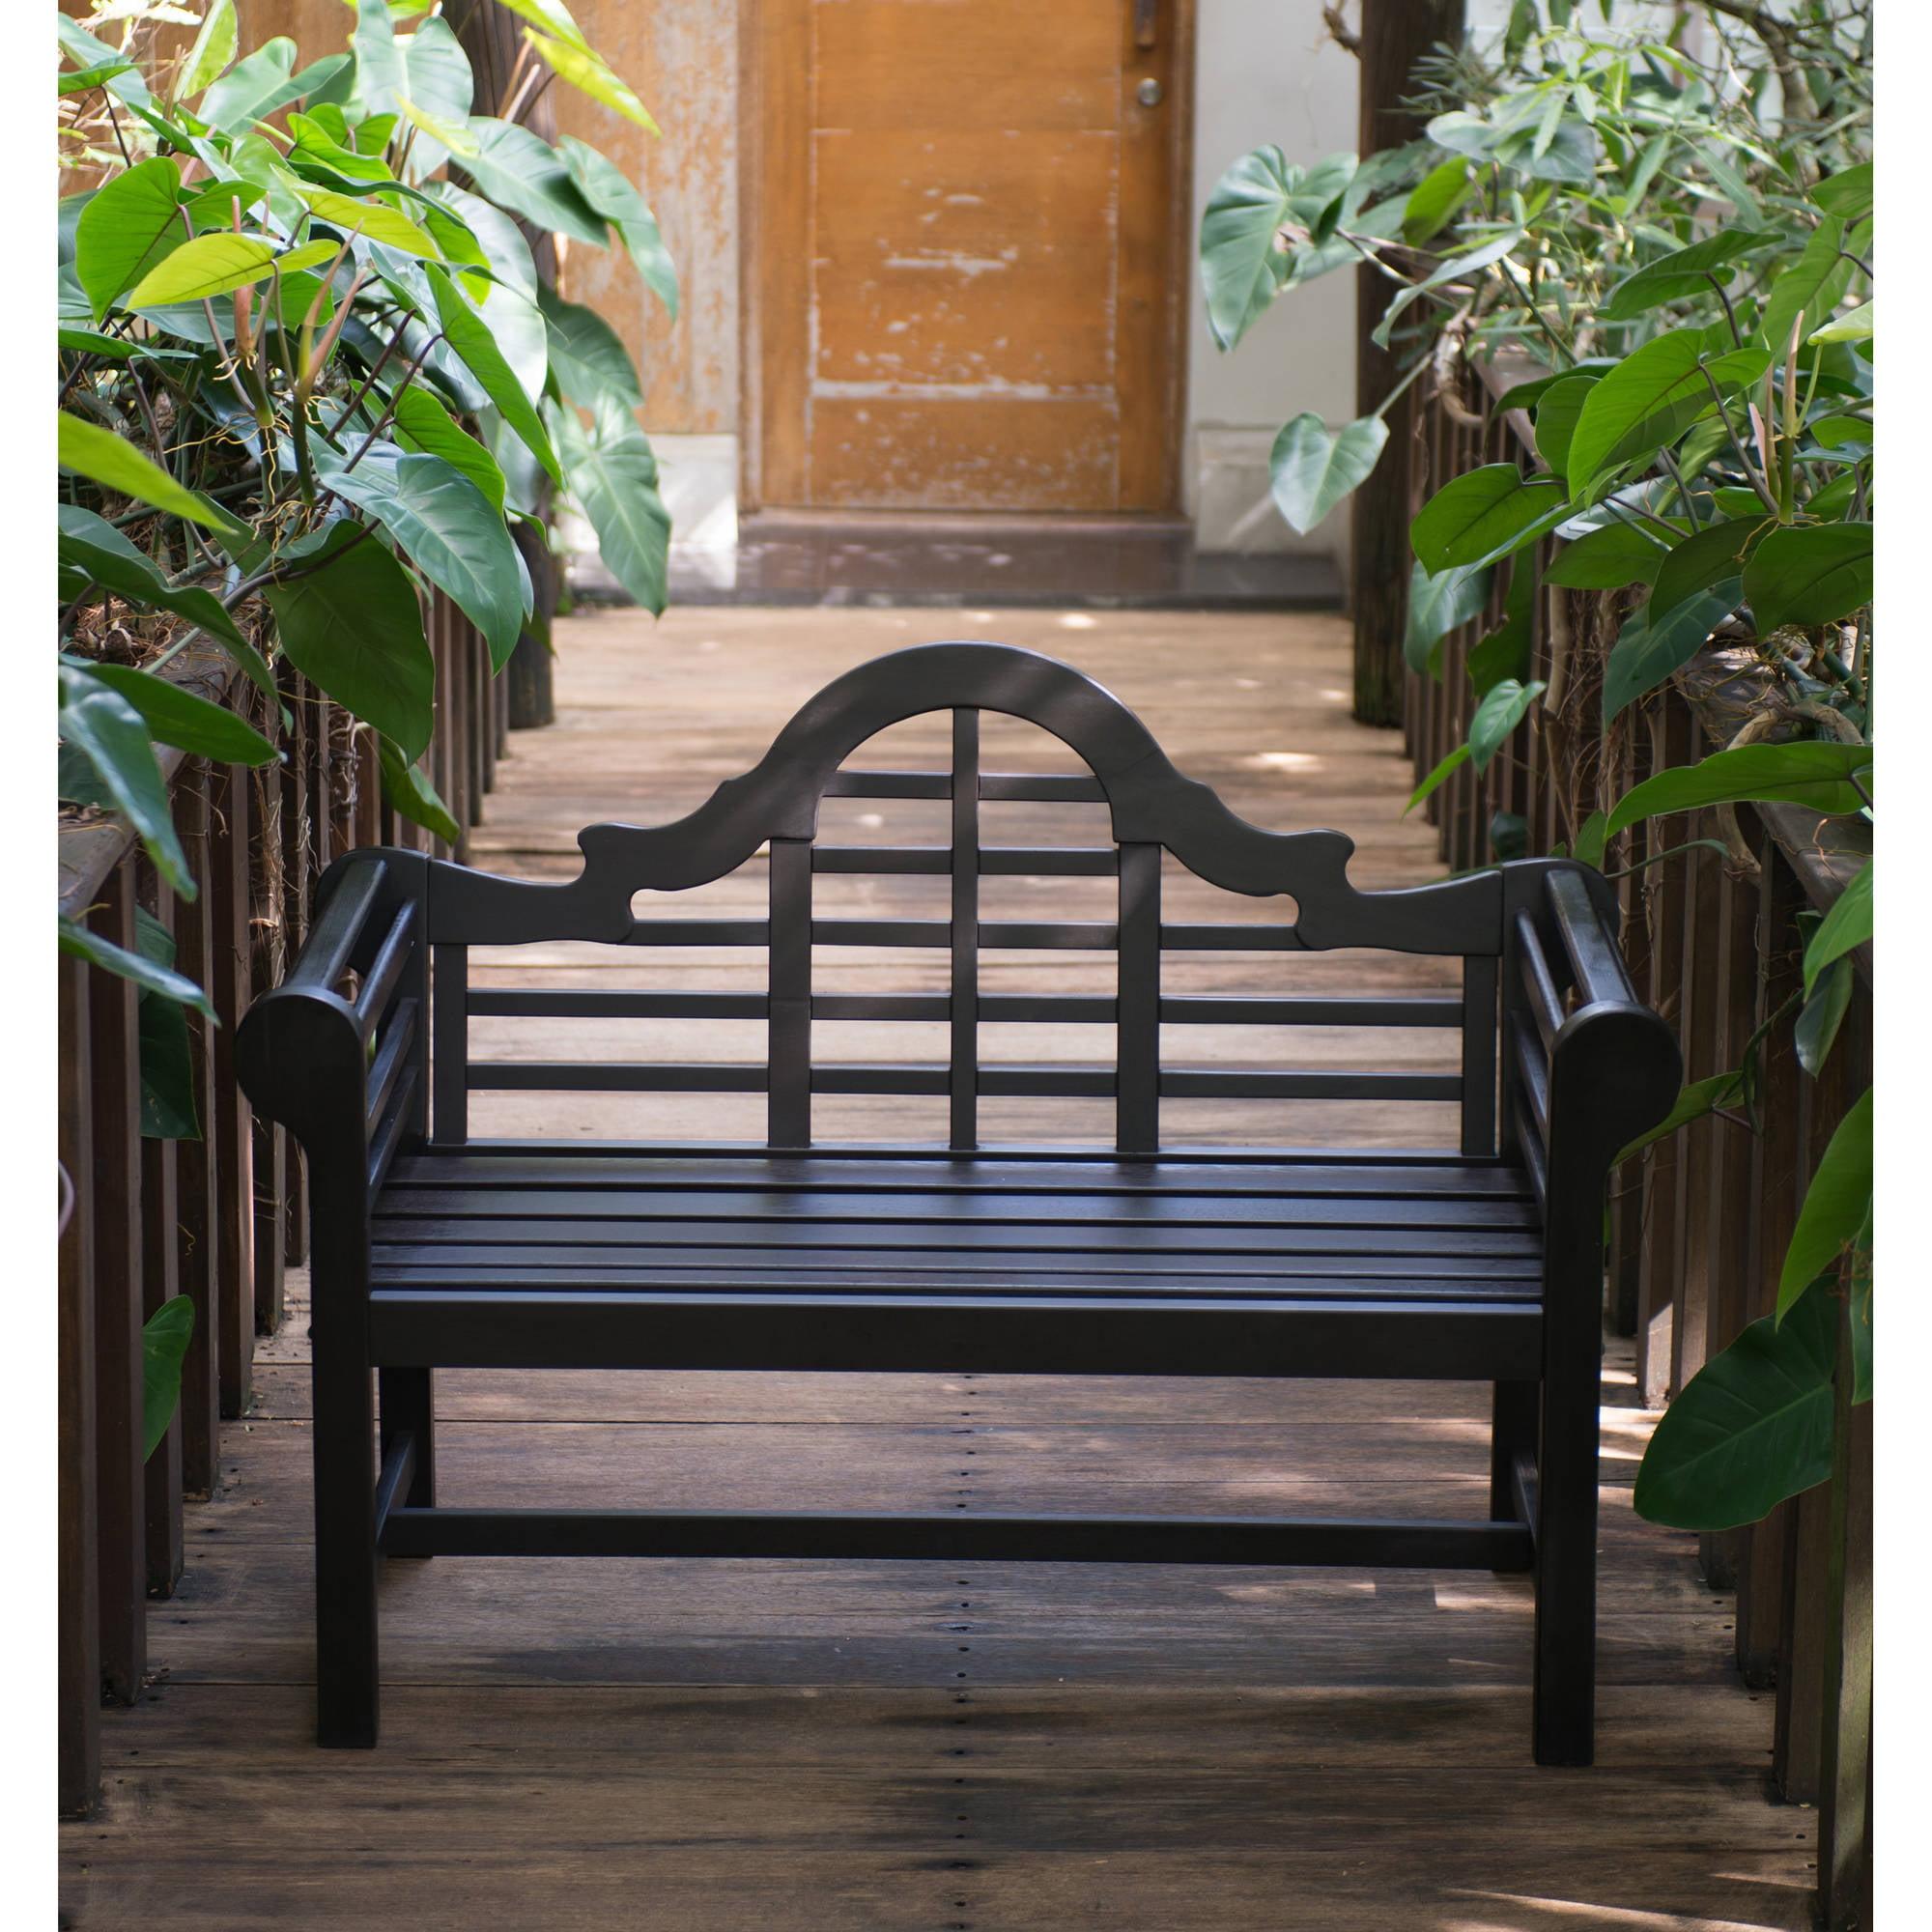 4' Lutyen's Bench, Dark Brown